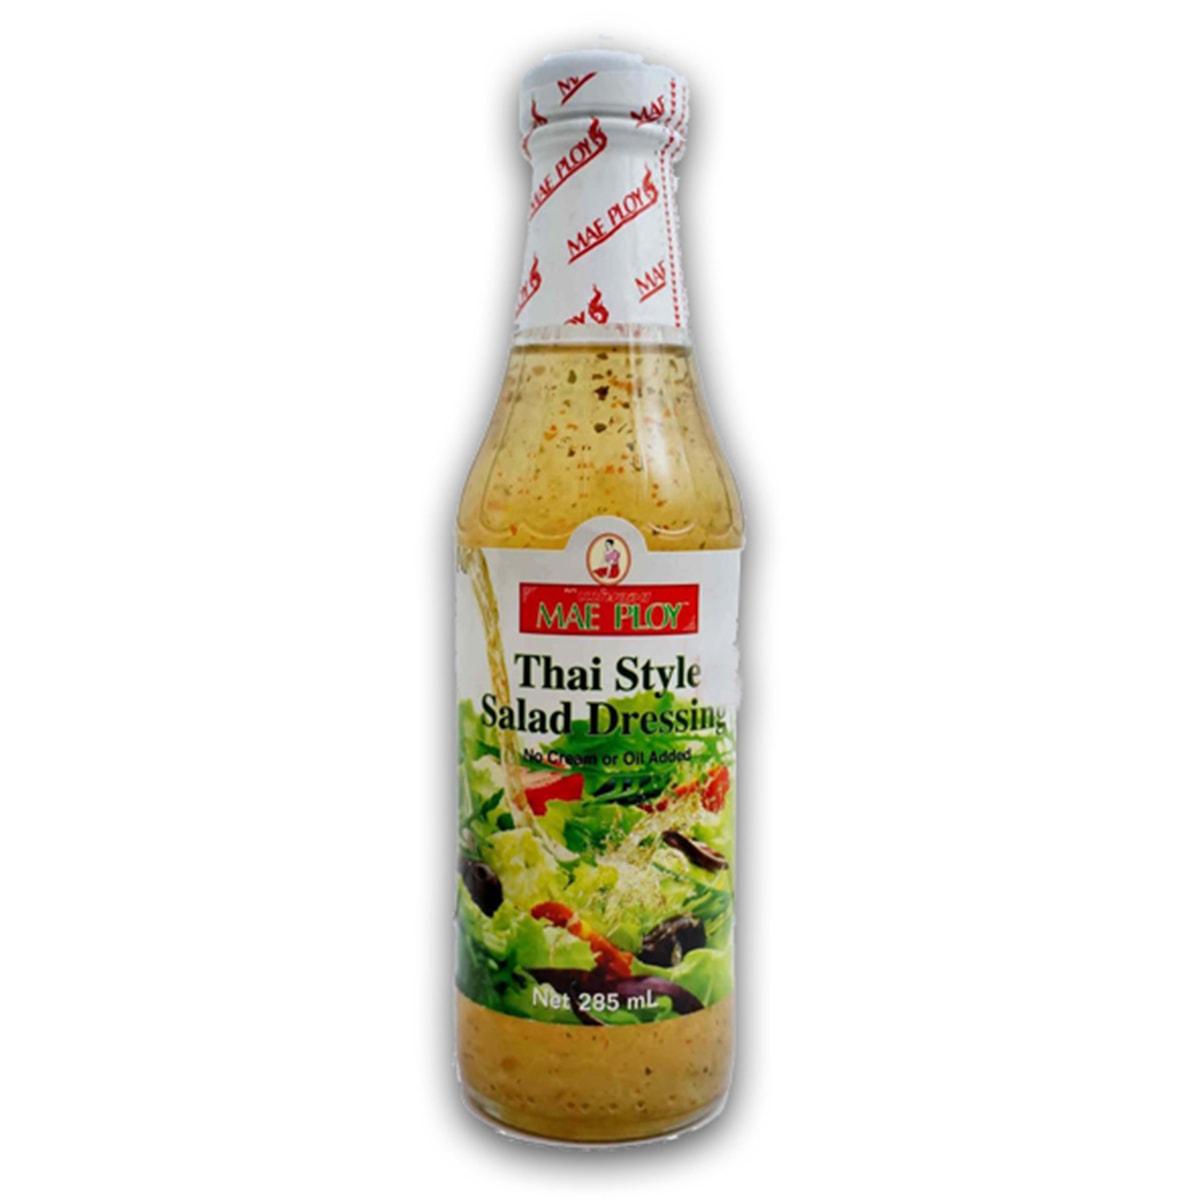 Buy Mae Ploy Thai Style Salad Dressing - 285 gm